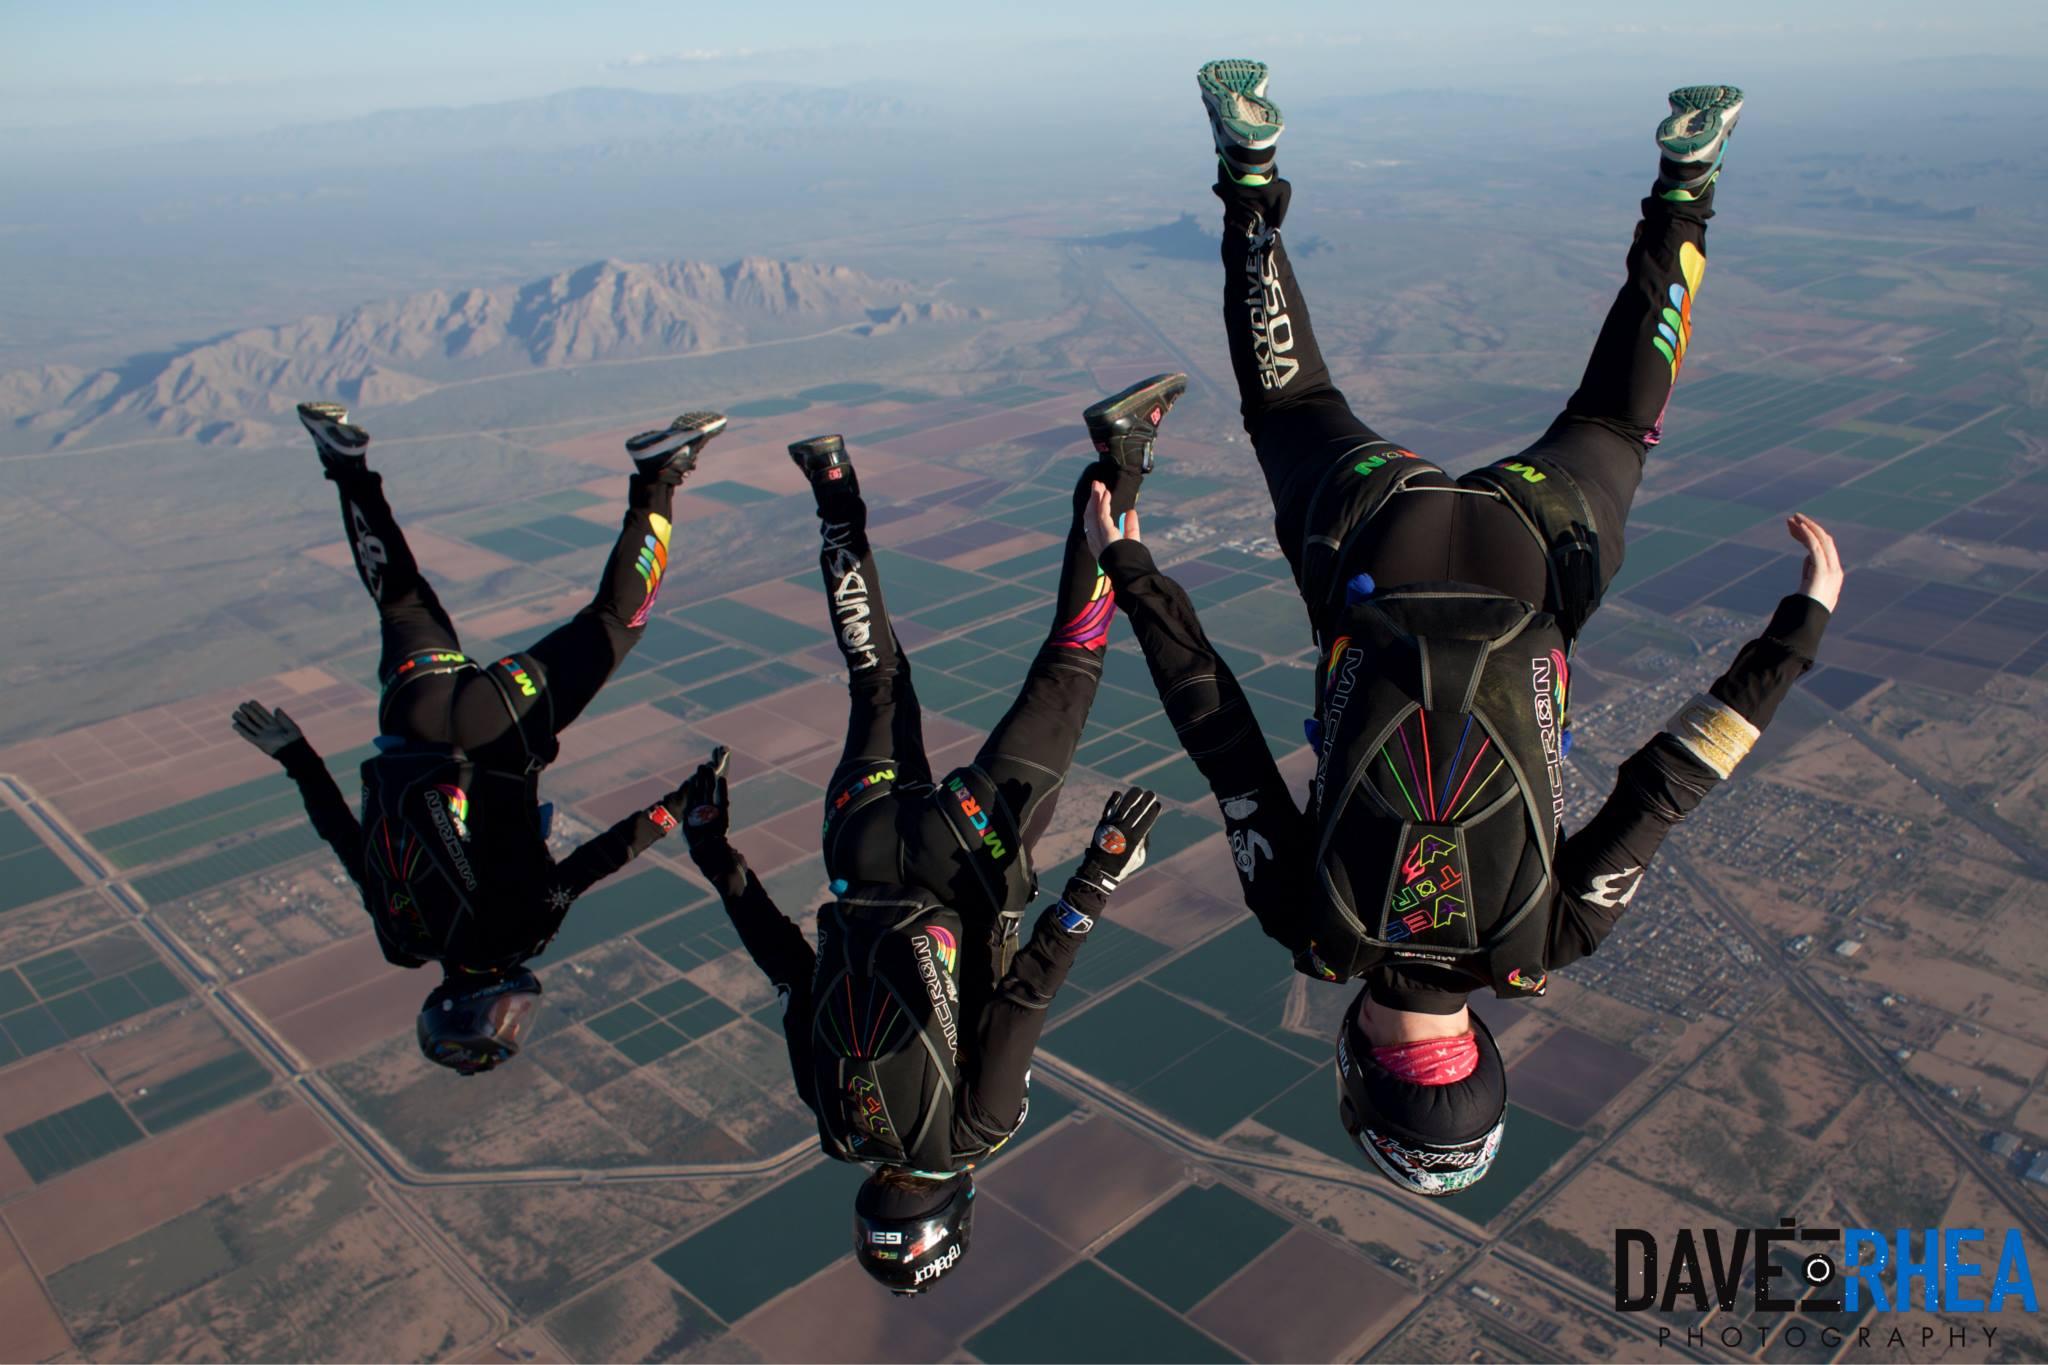 Joyriding over Skydive AZ